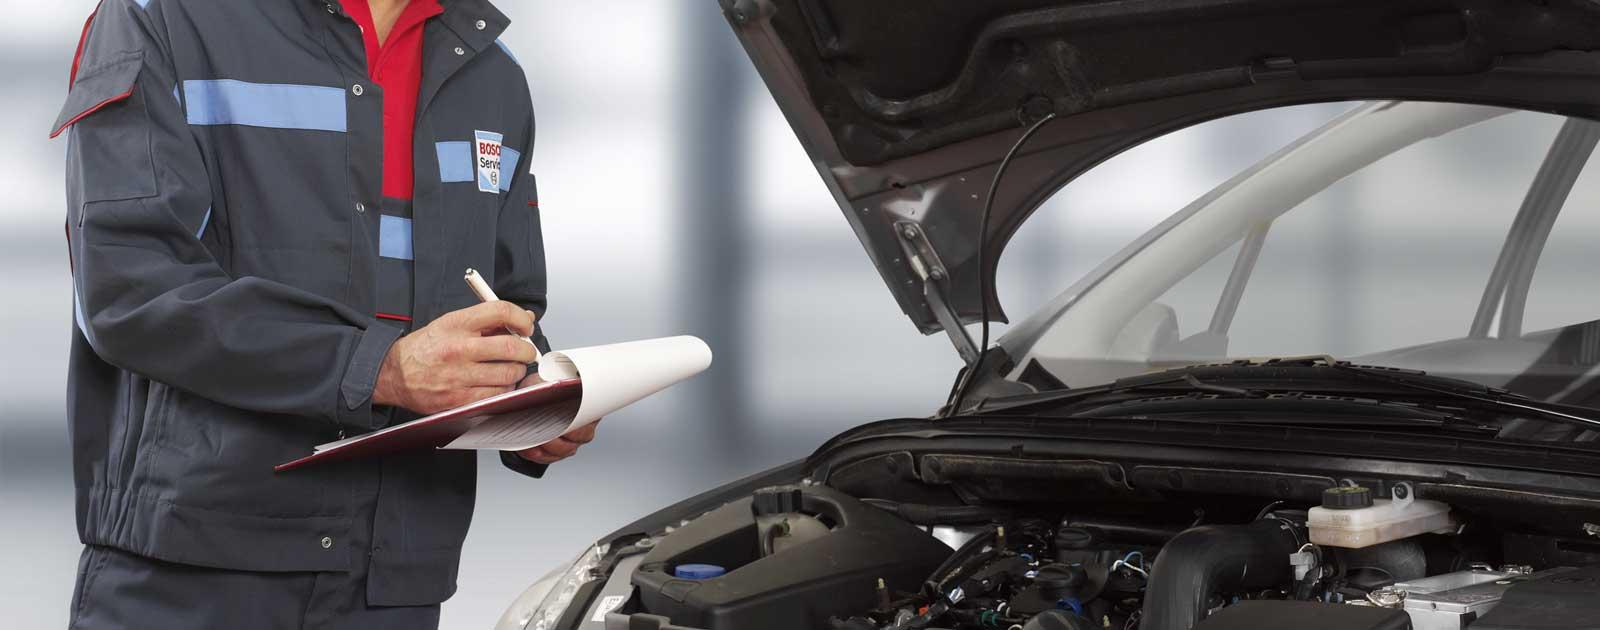 Bosch Auto Inspektions Service in Coburg